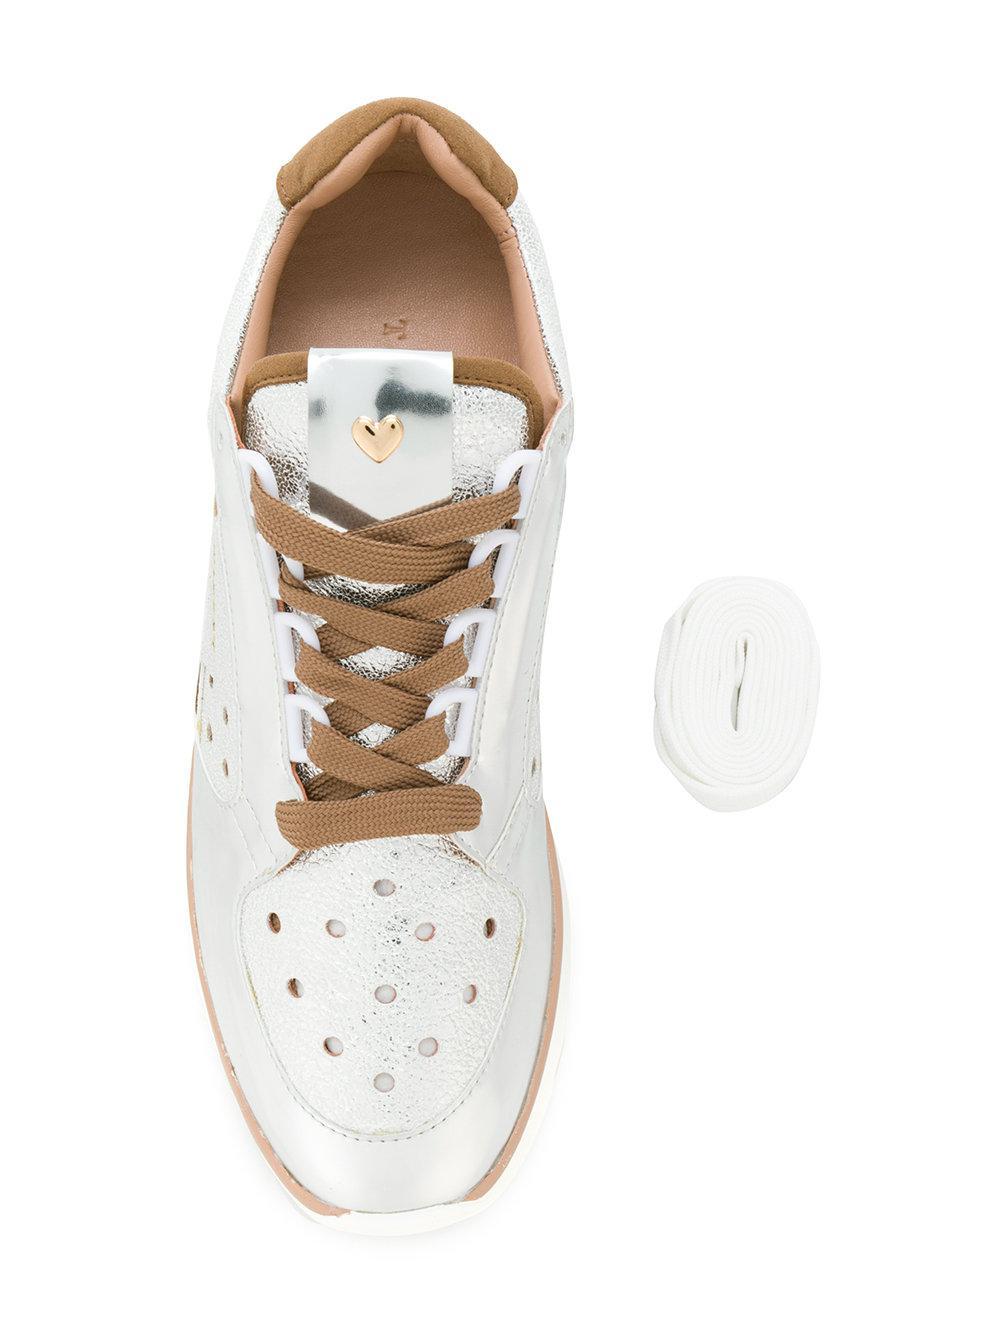 Twin Set Leather Platform Sneakers in Metallic